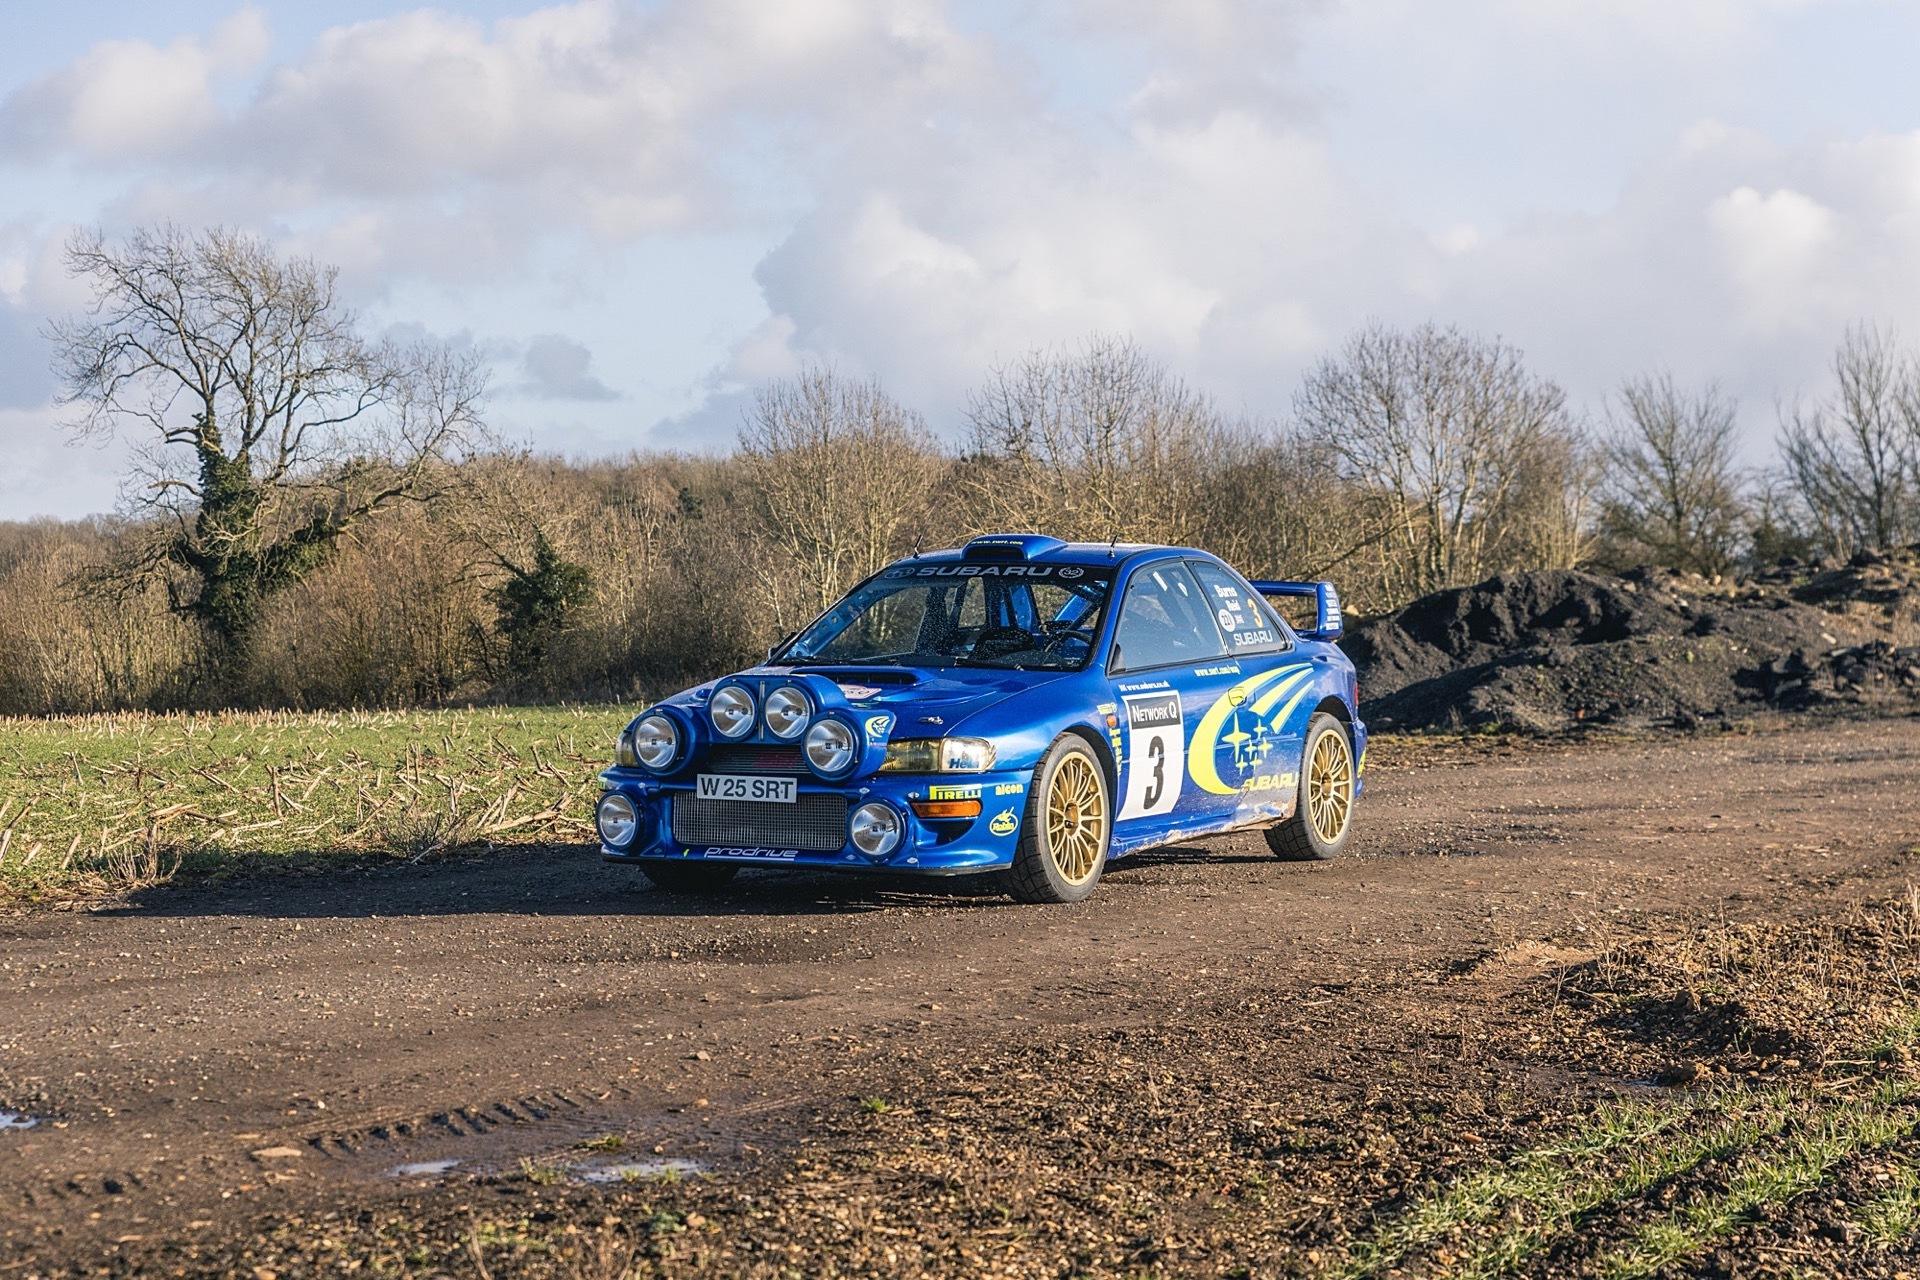 Richard_Burns_Subaru_Impreza_WRC_sale-0010